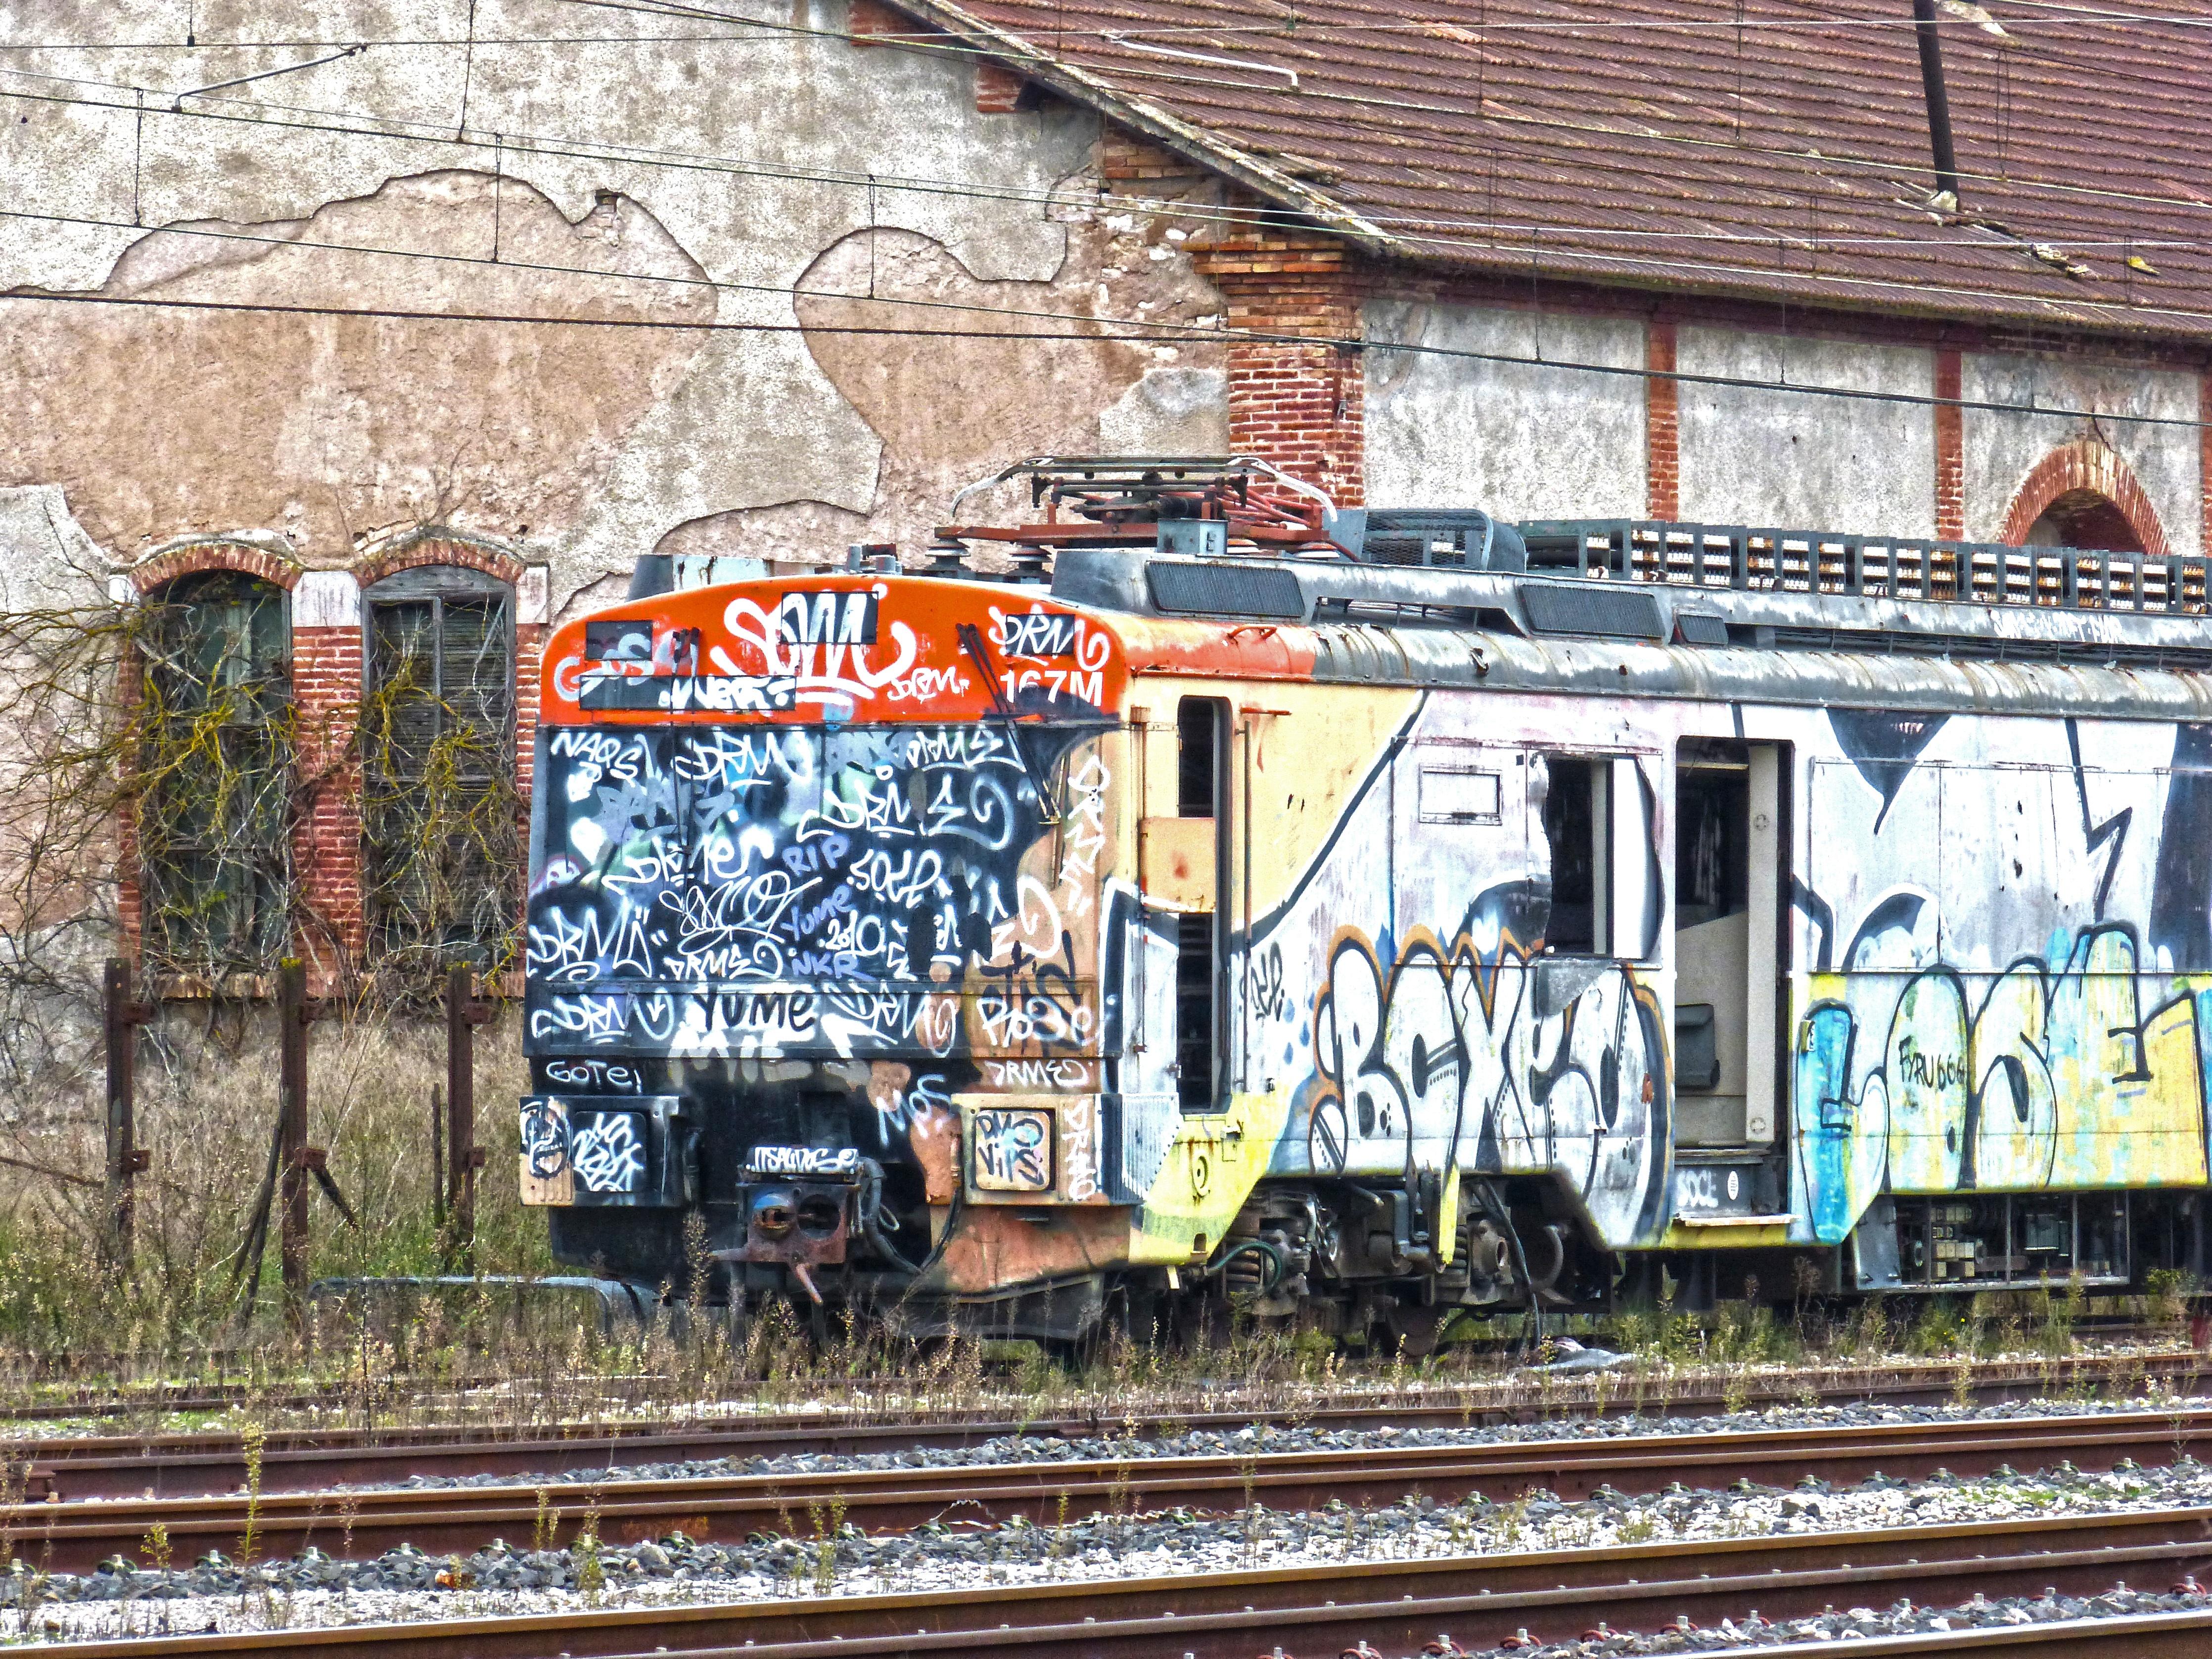 Track train transport vehicle abandoned graffiti art locomotive vandalism rail transport urban area rolling stock railroad